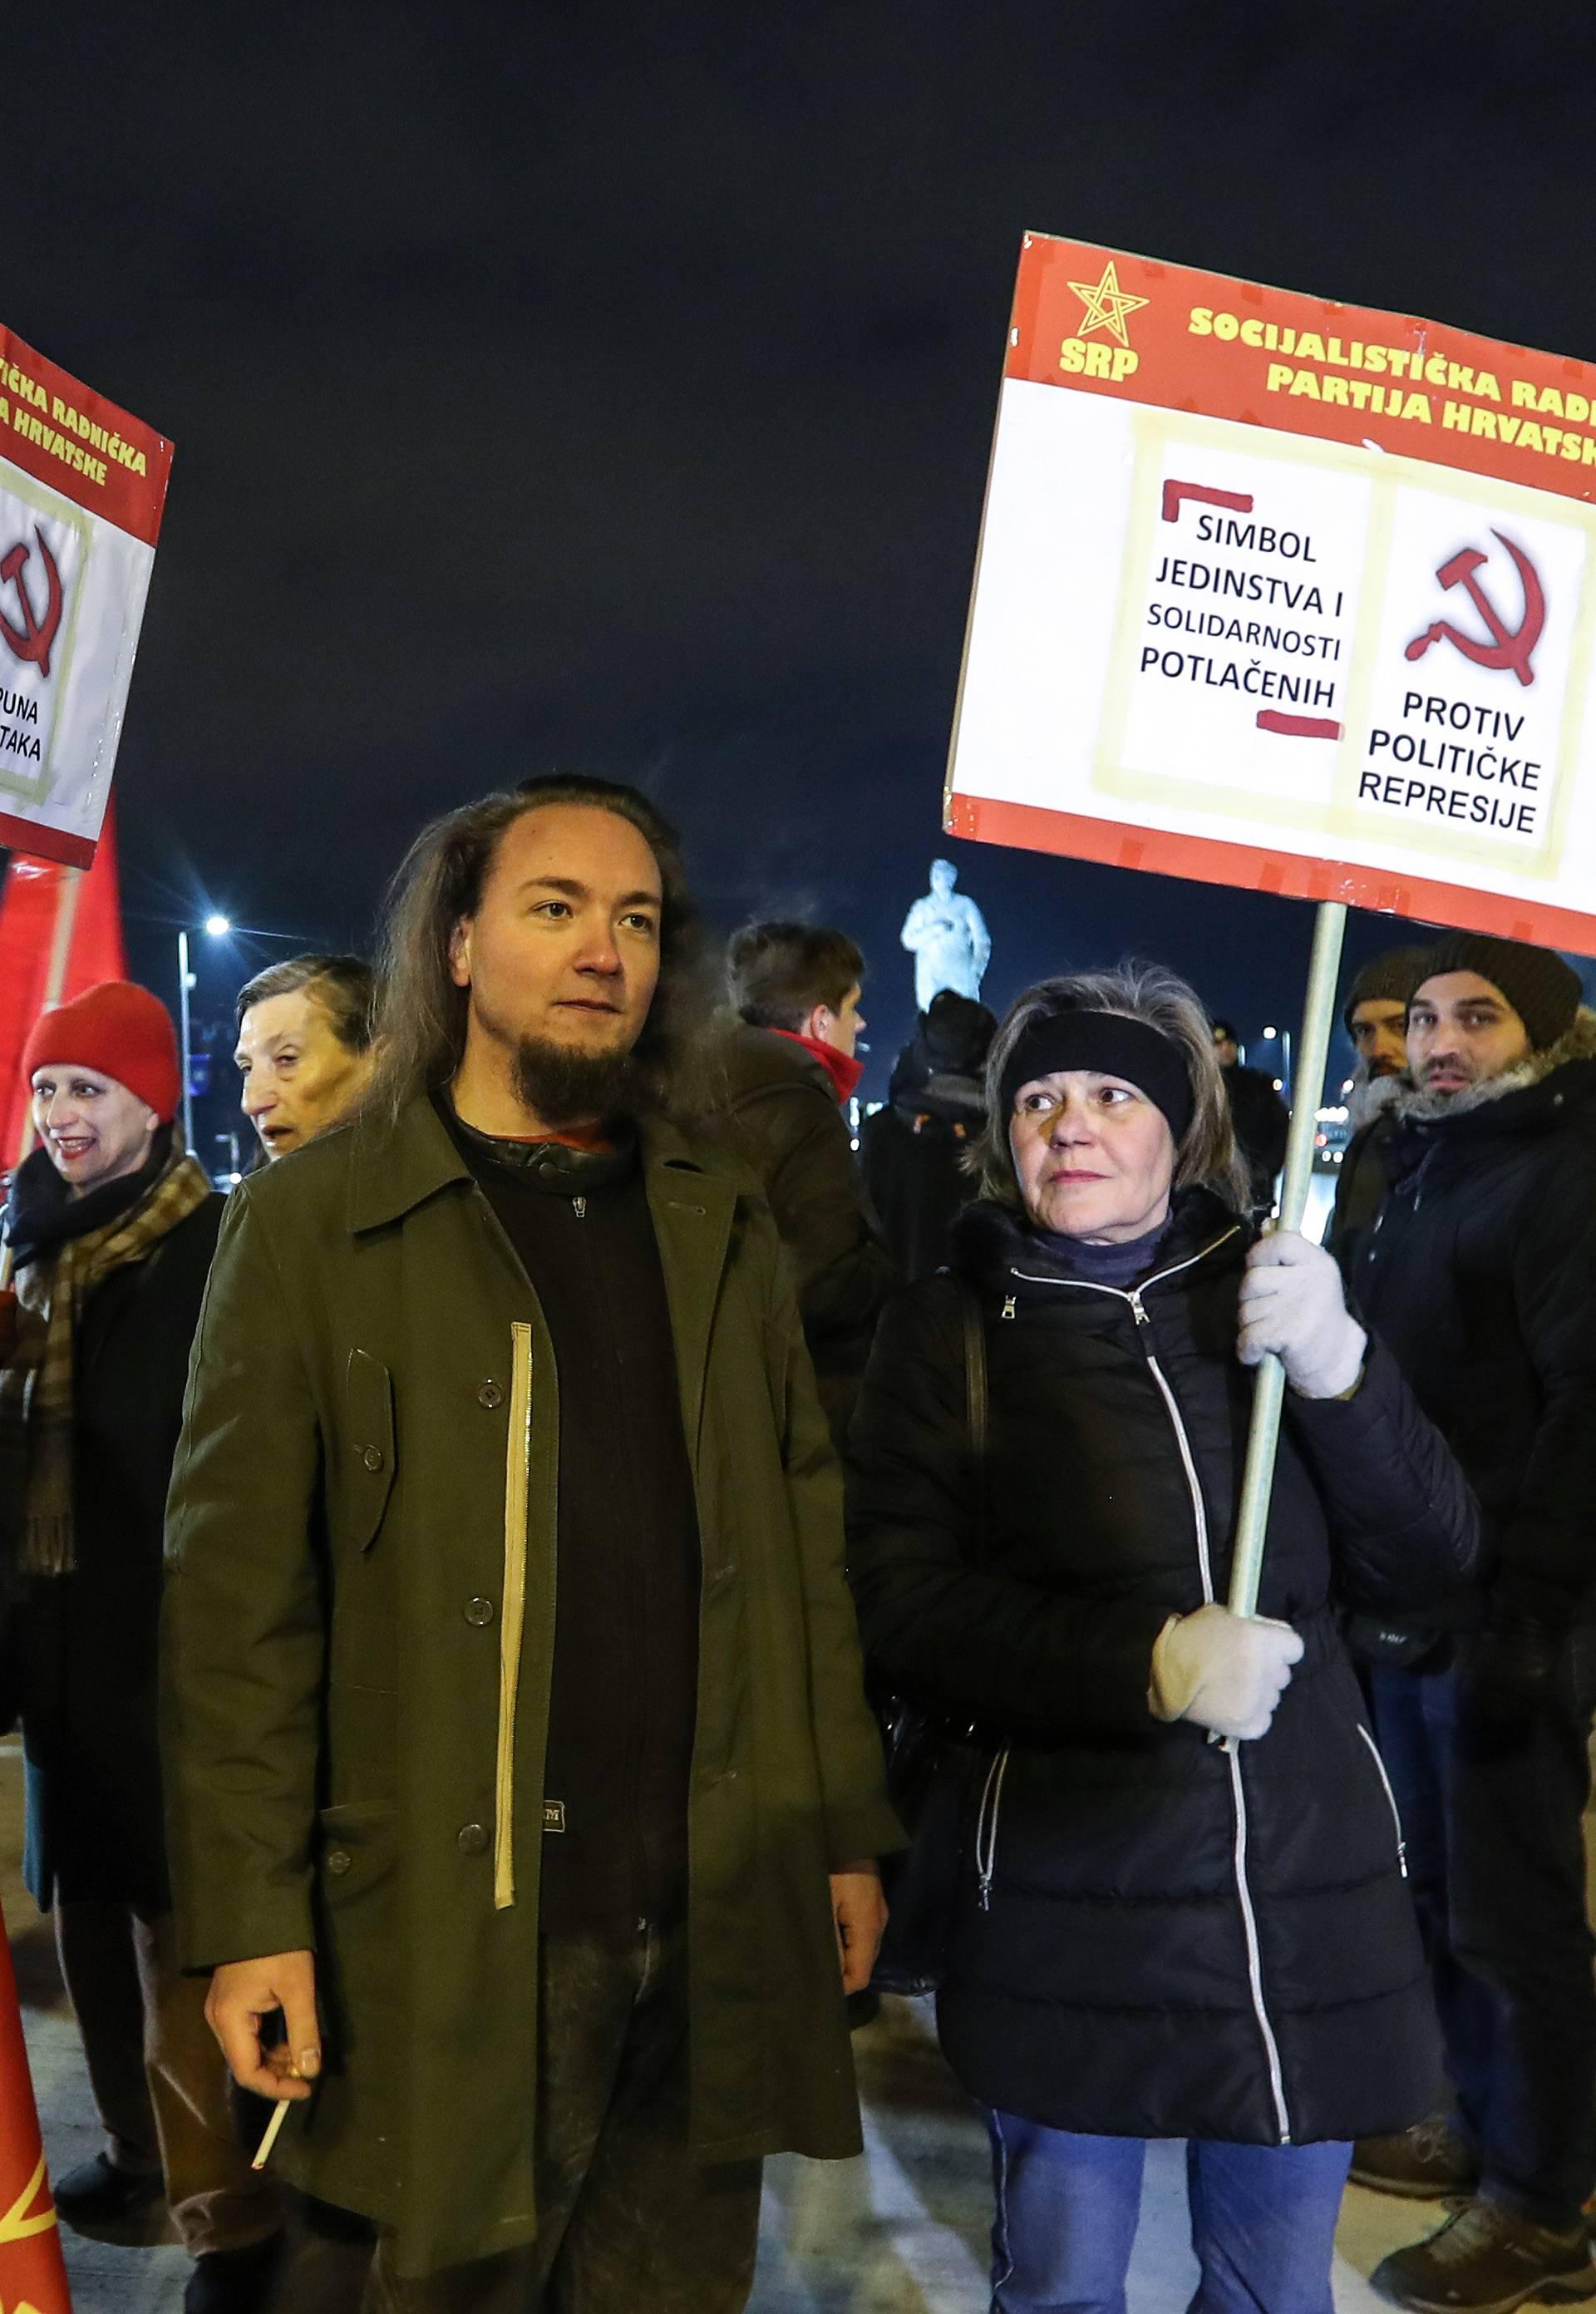 Zagreb: Ispred spomenika Franji Tuđmanu održan prosvjed protiv političke represije